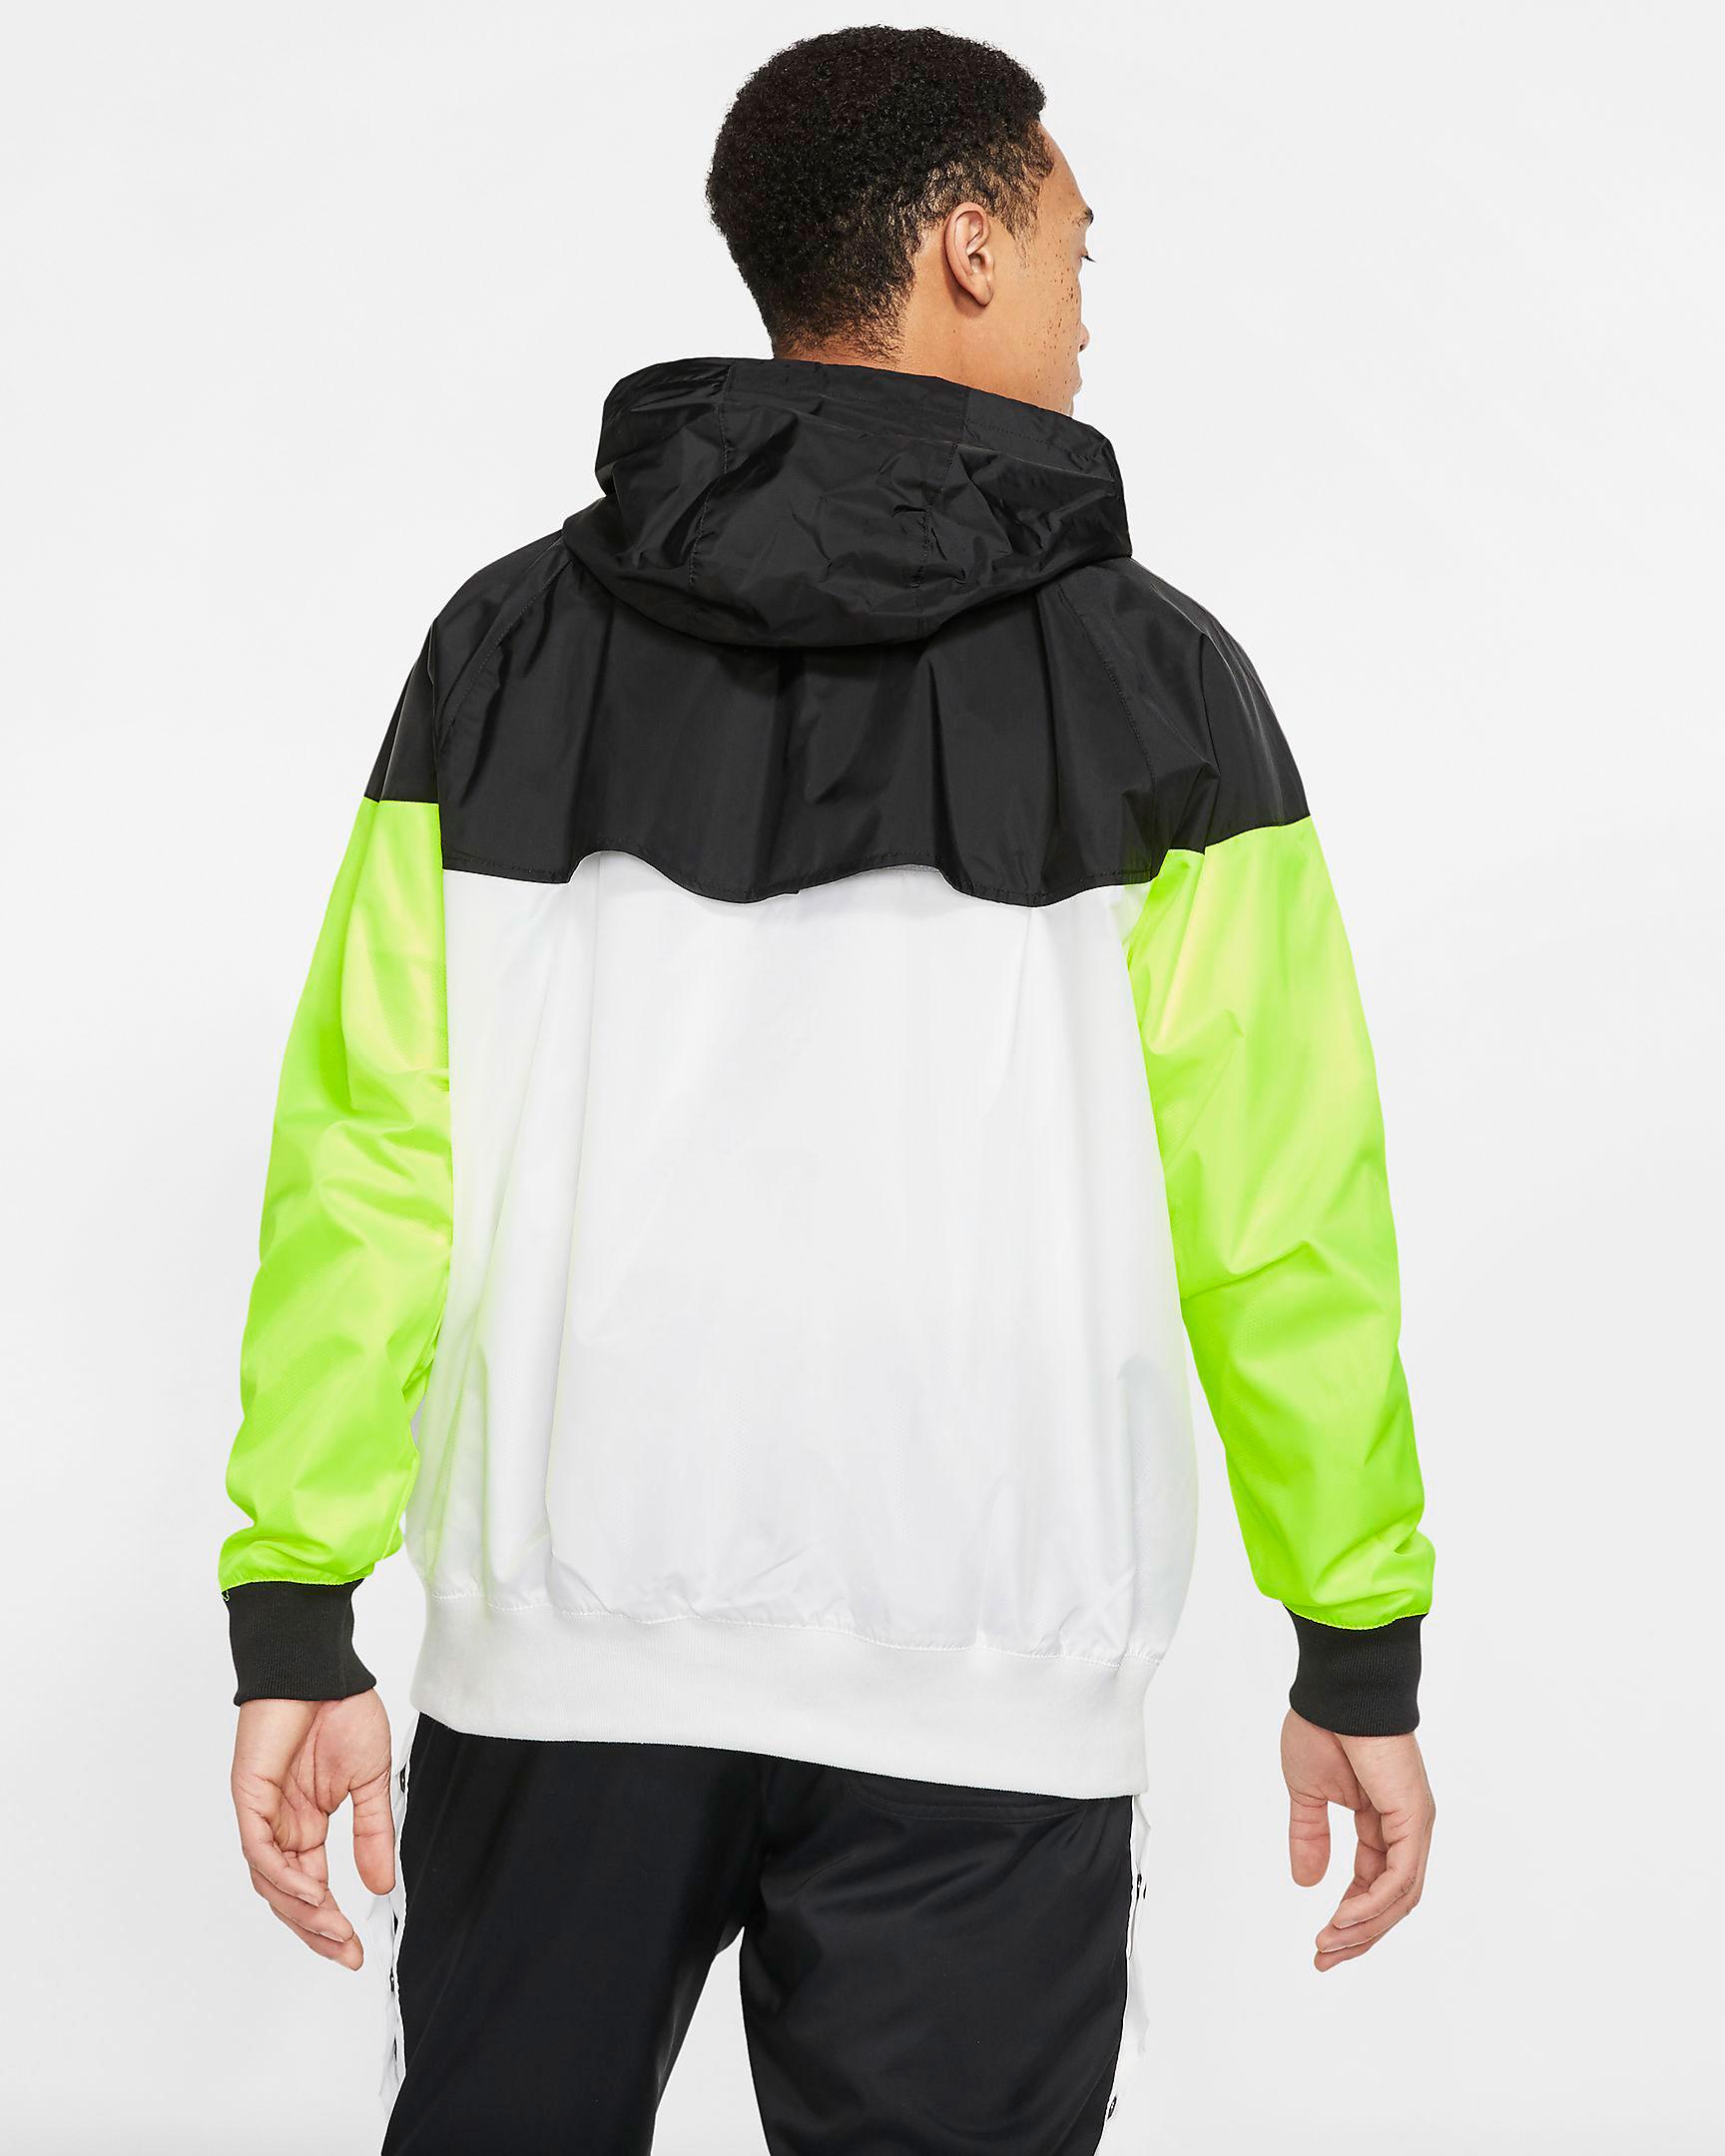 air-jordan-4-neon-volt-nike-jacket-match-2